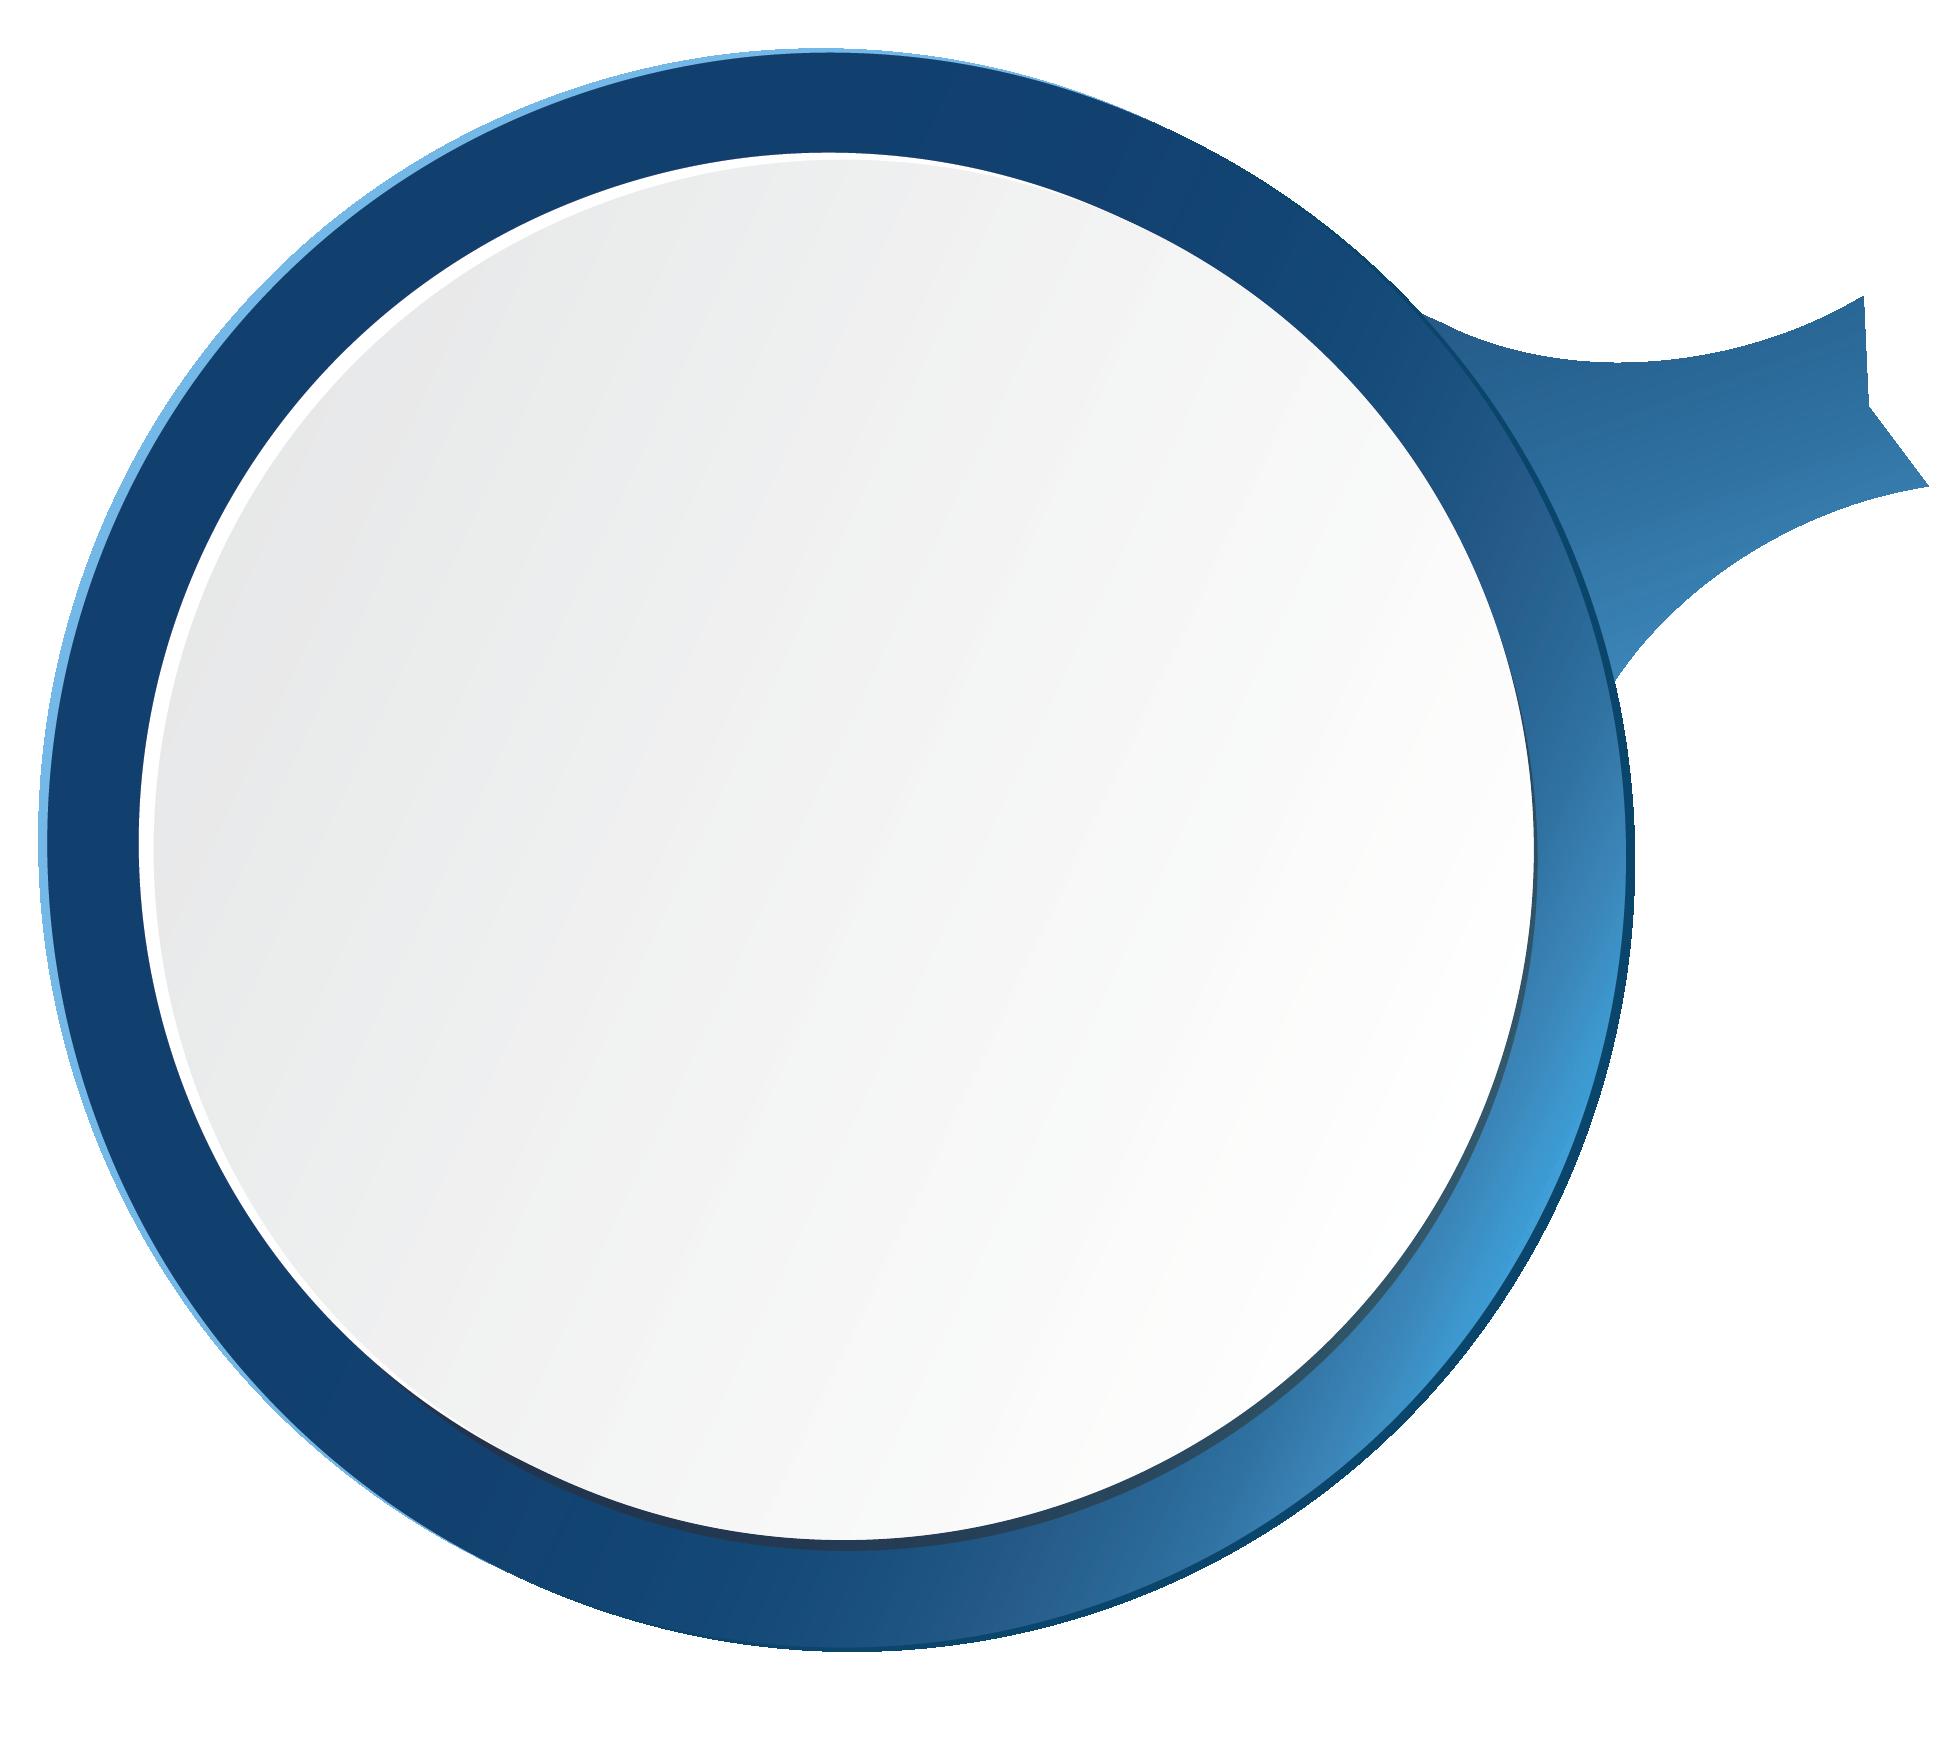 circle-title